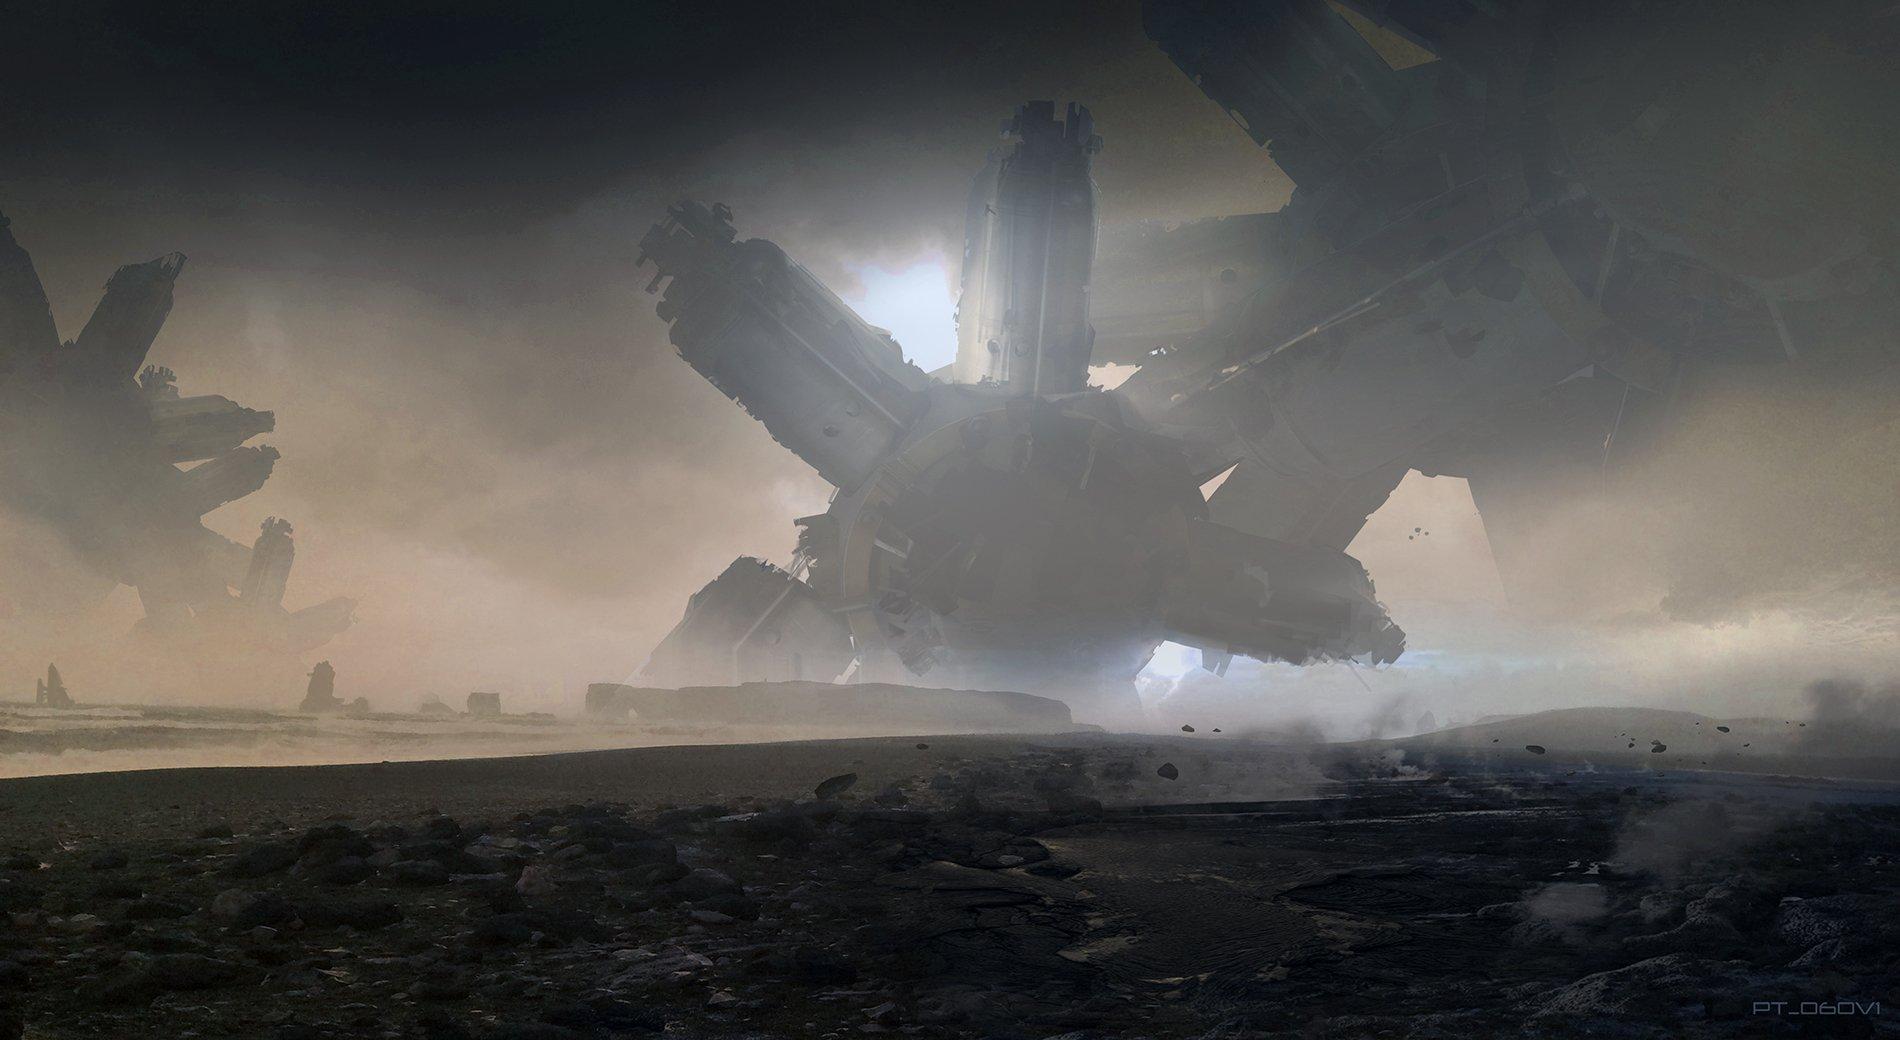 Концепт-арт Войны Бесконечности: Titan by Pete Thompson